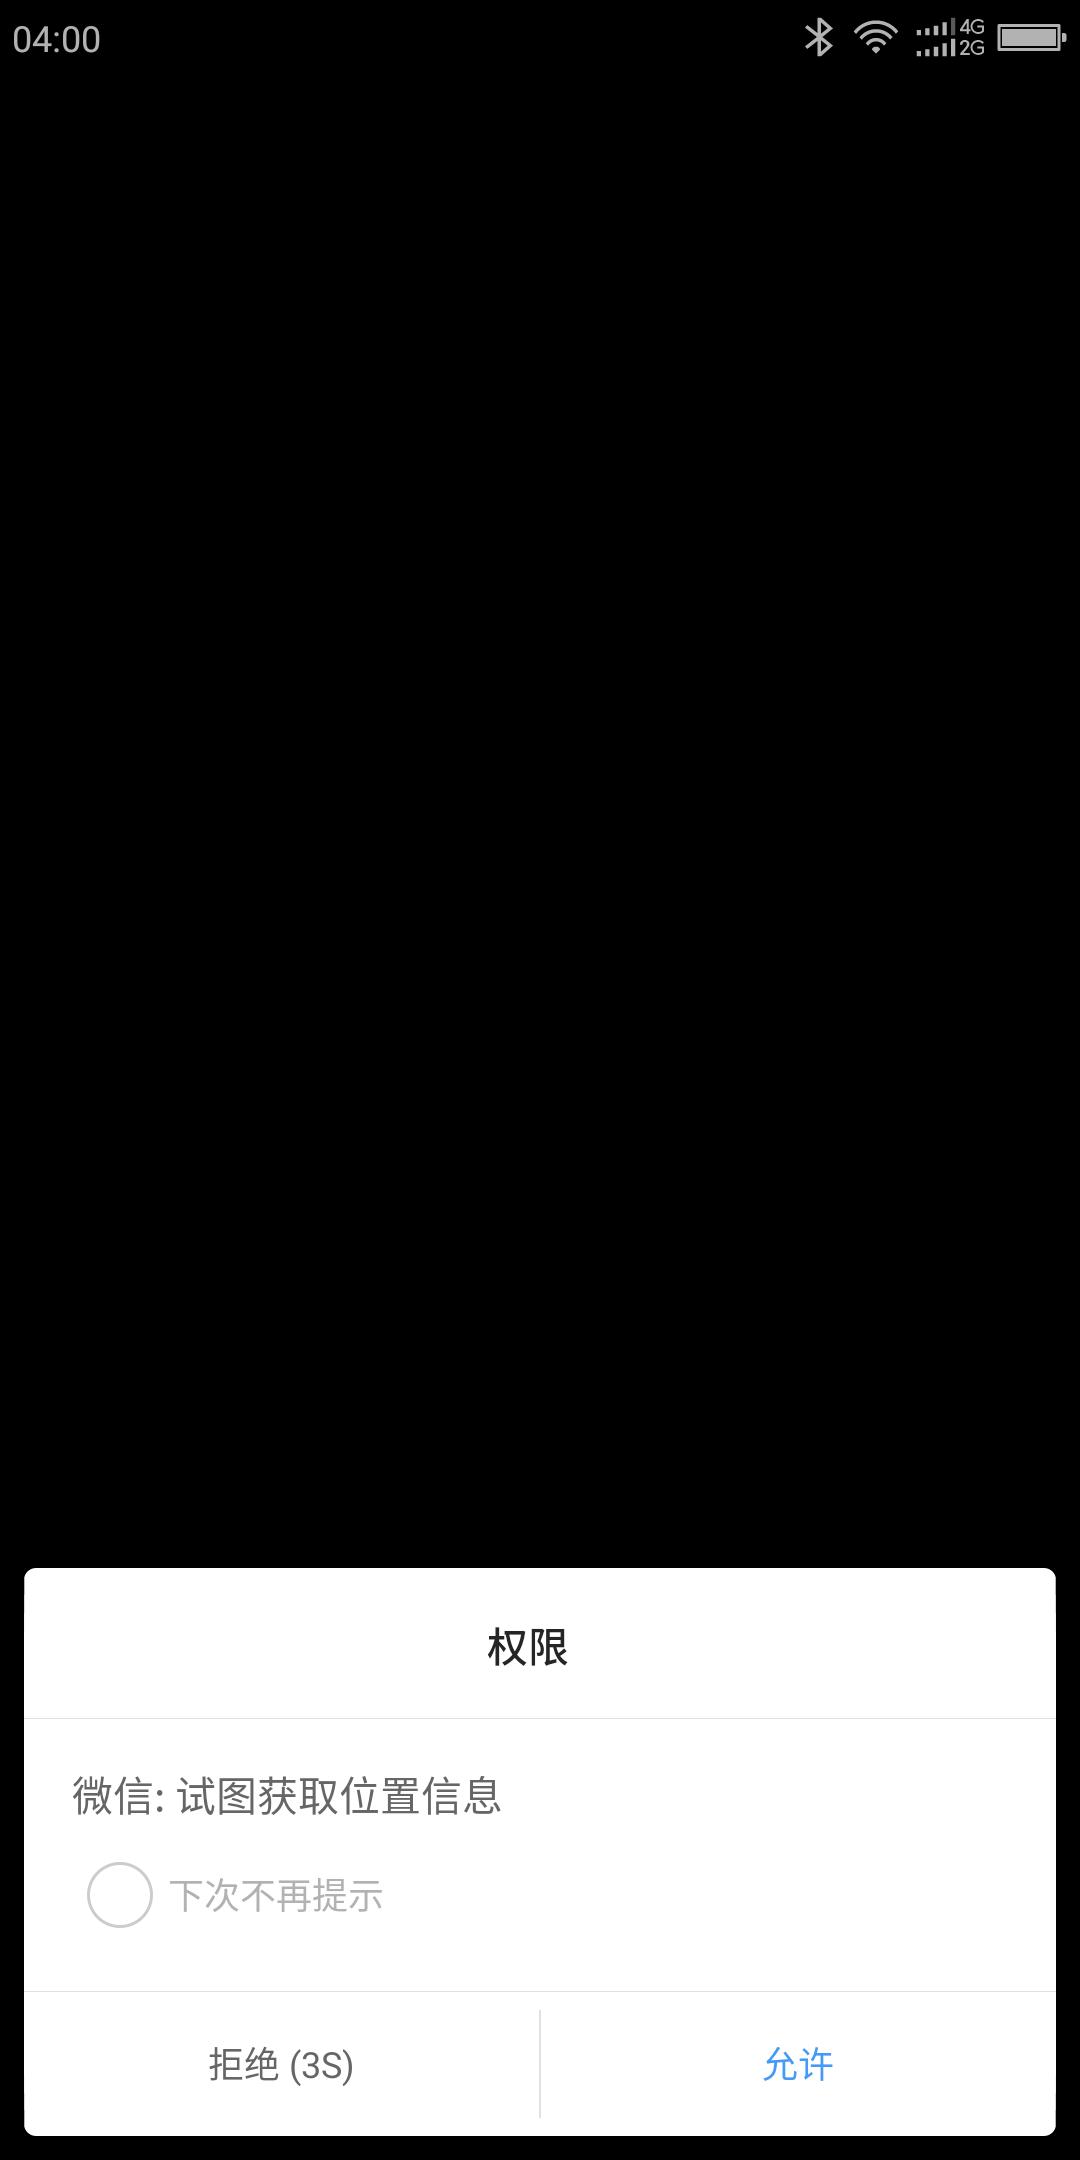 Screenshot_2018-04-10-04-00-38.png